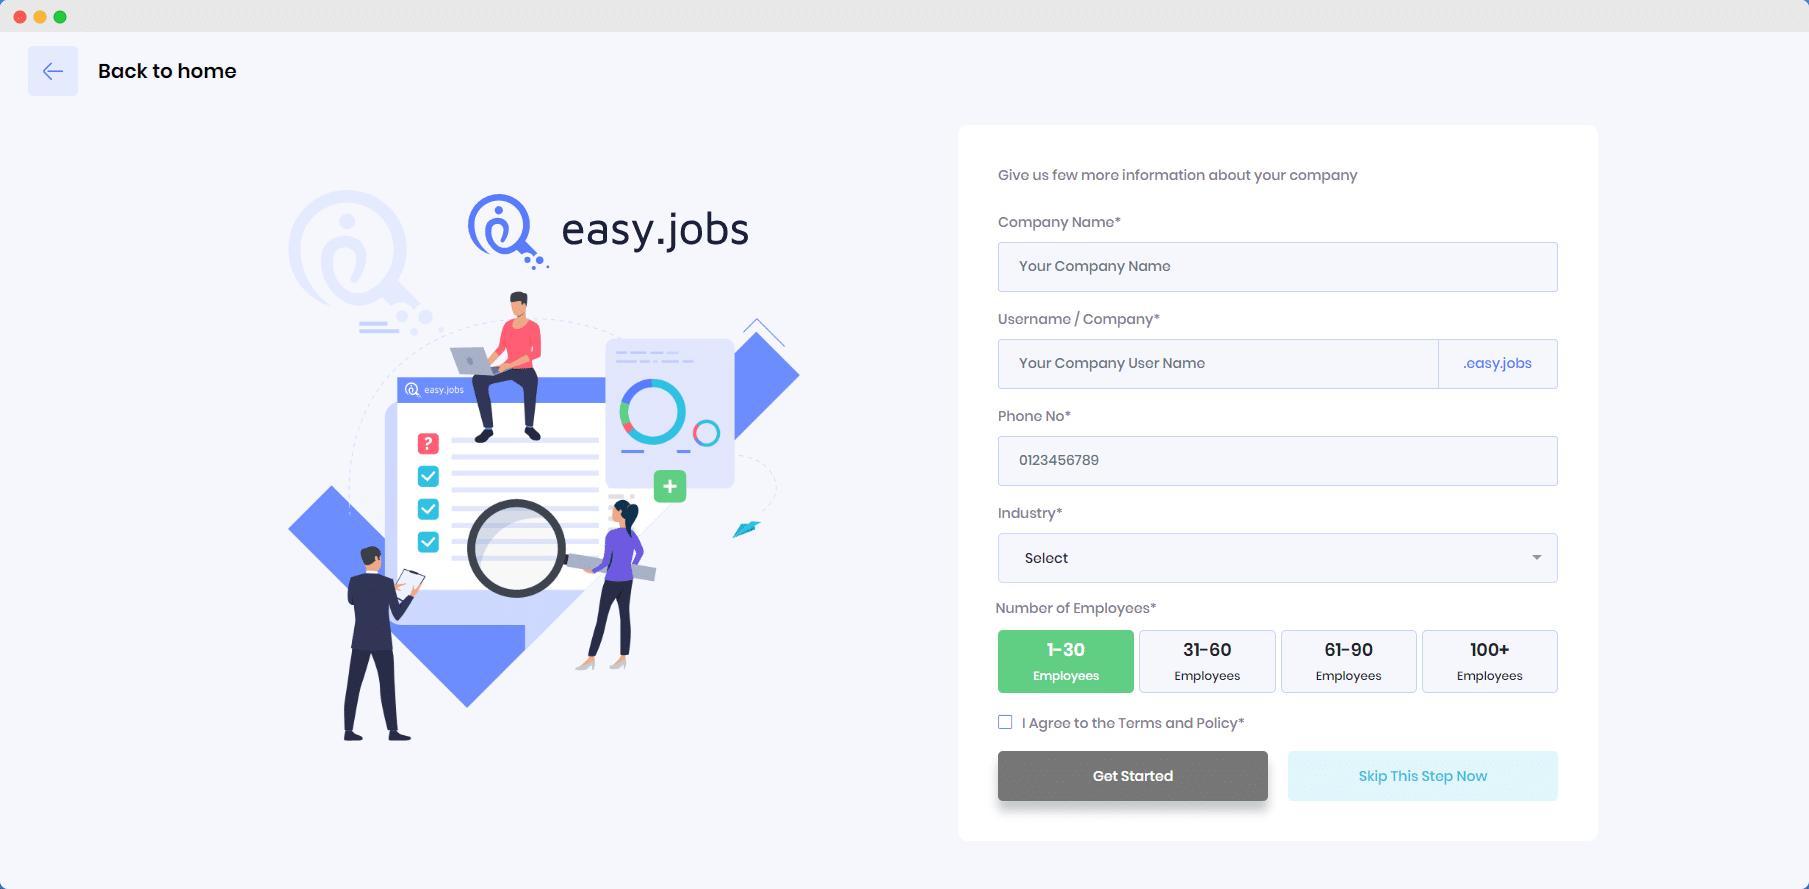 Erste Schritte, easy.jobs